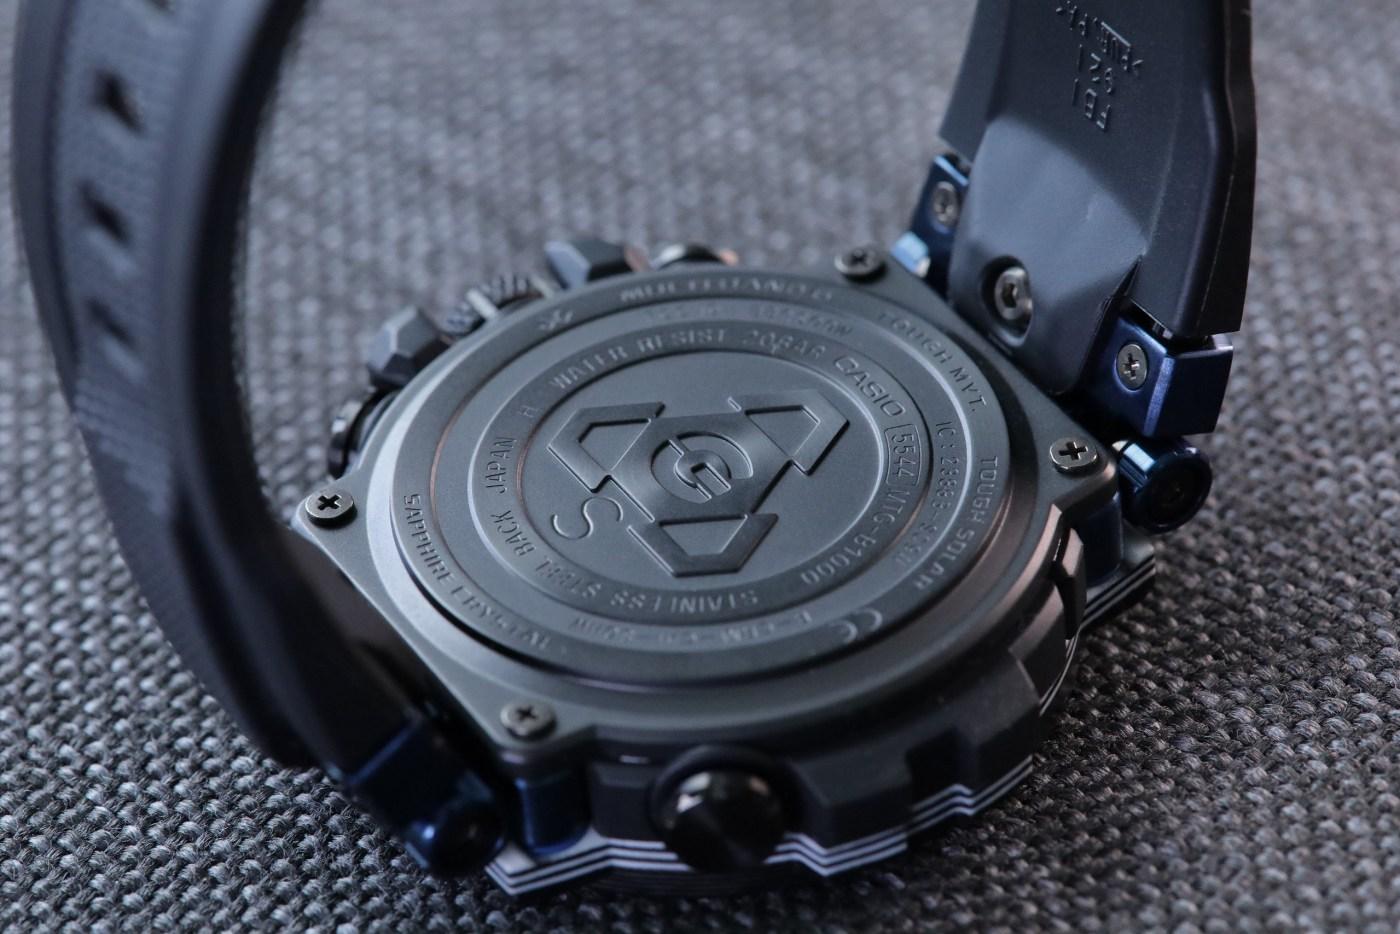 G-Shock MT-G Carbon Fiber MTGB1000XB-1A caseback